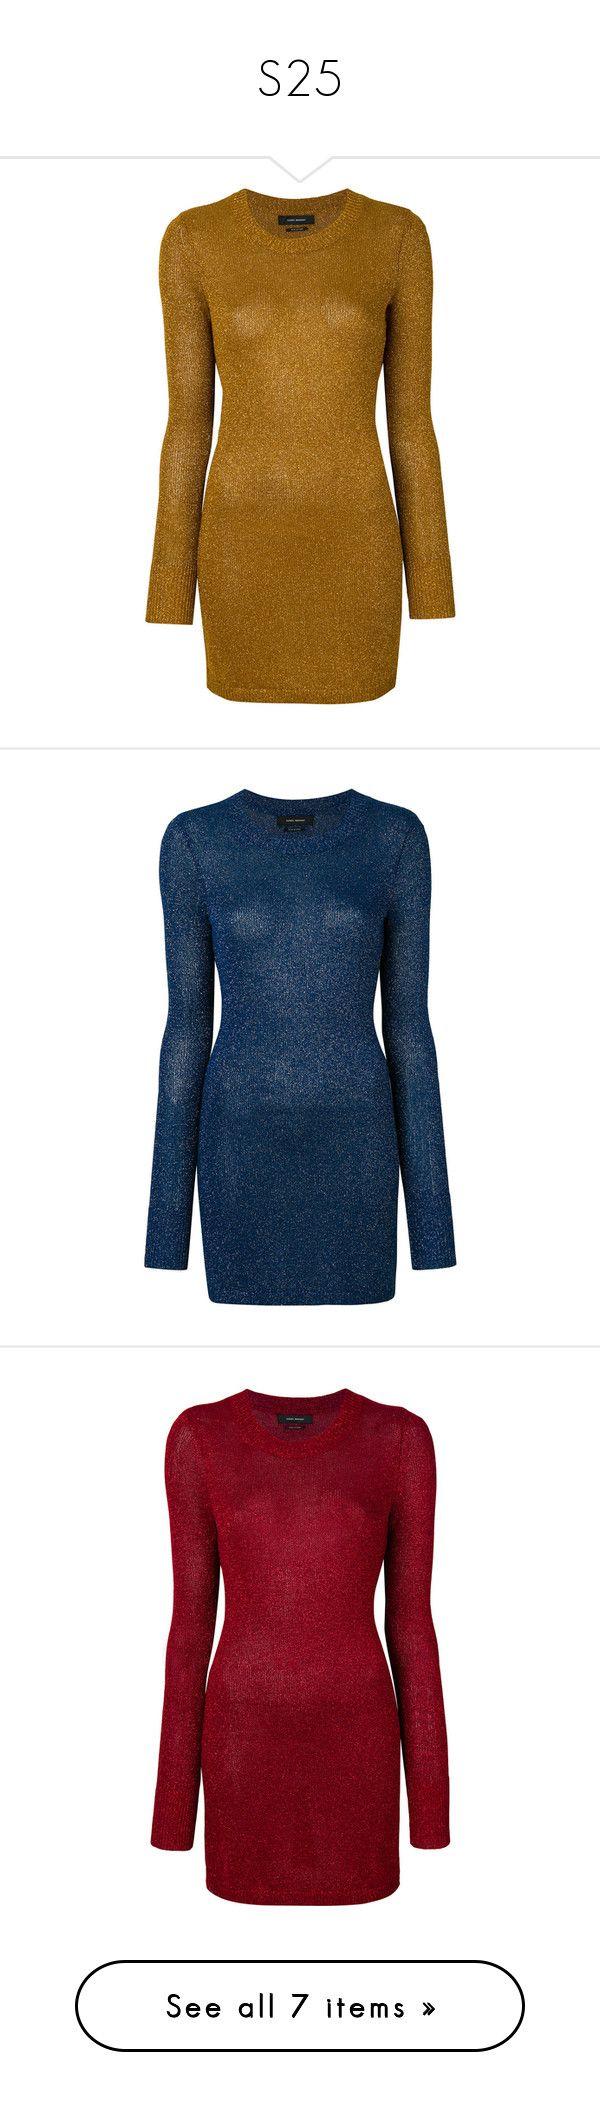 """S25"" by katiemarilexa ❤ liked on Polyvore featuring dresses, metallic, sweater dress, long sleeve sparkly dress, long sleeve short dress, brown sweater dress, short sparkly dresses, blue, blue long sleeve dress and long sleeve bohemian dress"